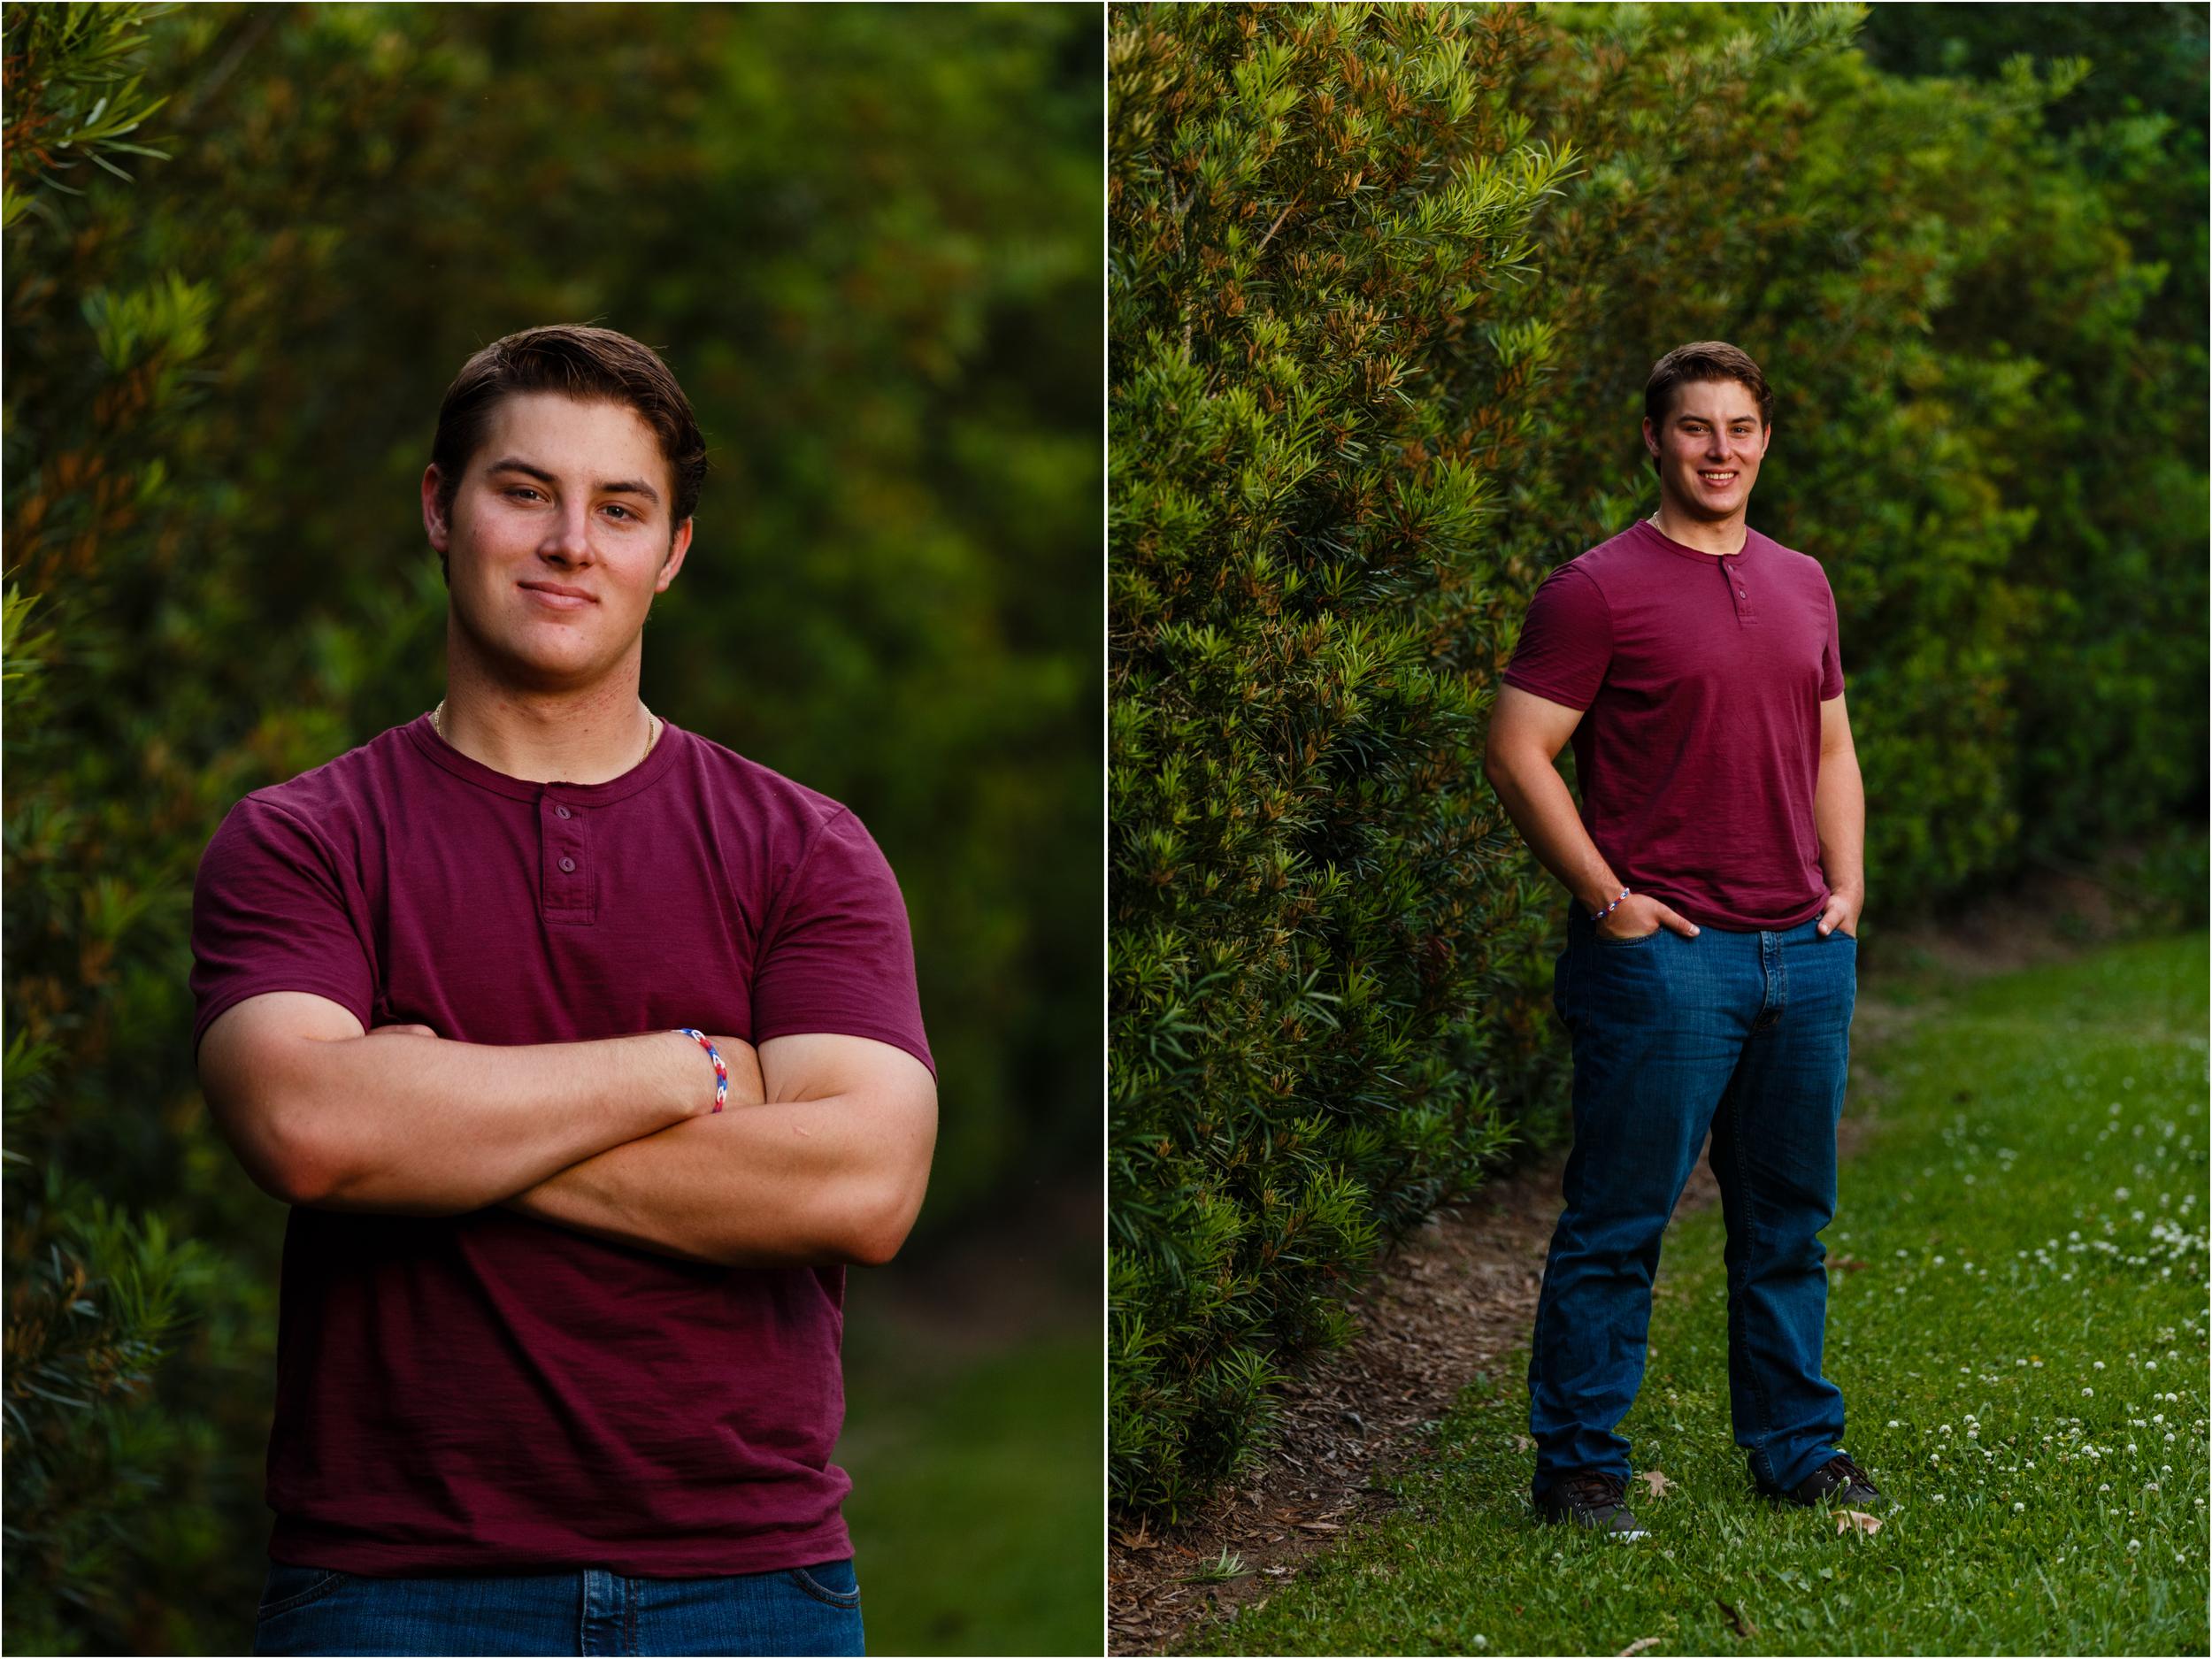 senior-portrait-lafayette-broussard-youngsville-photographer-1a.jpg